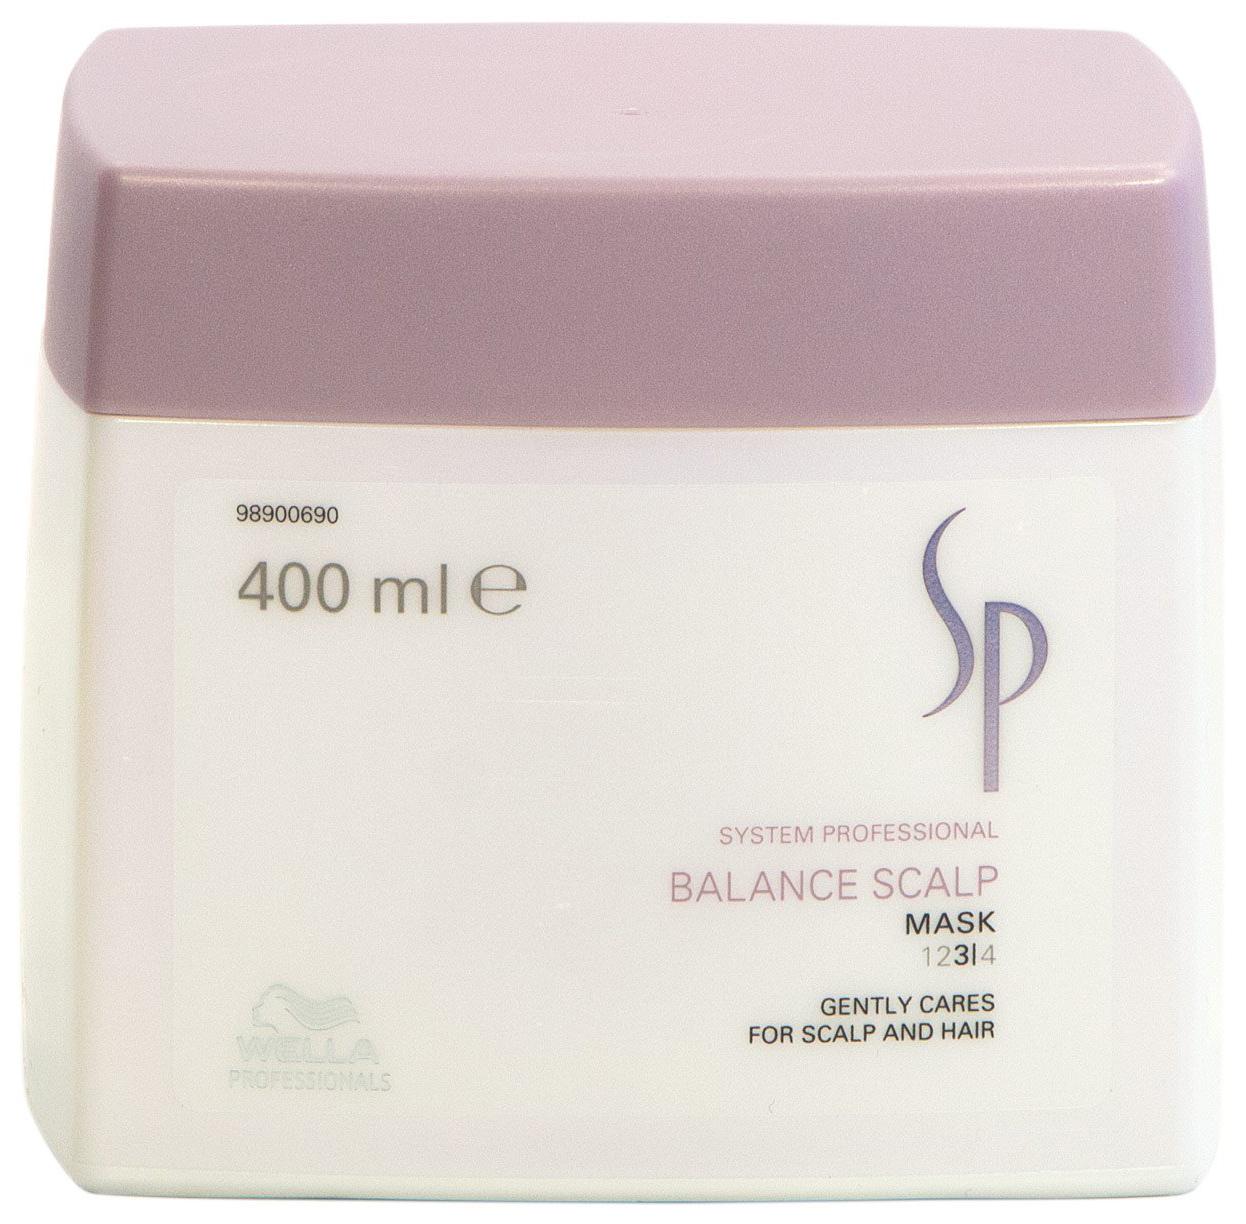 Маска для волос Wella System Professional Balance Scalp Mask 400 мл